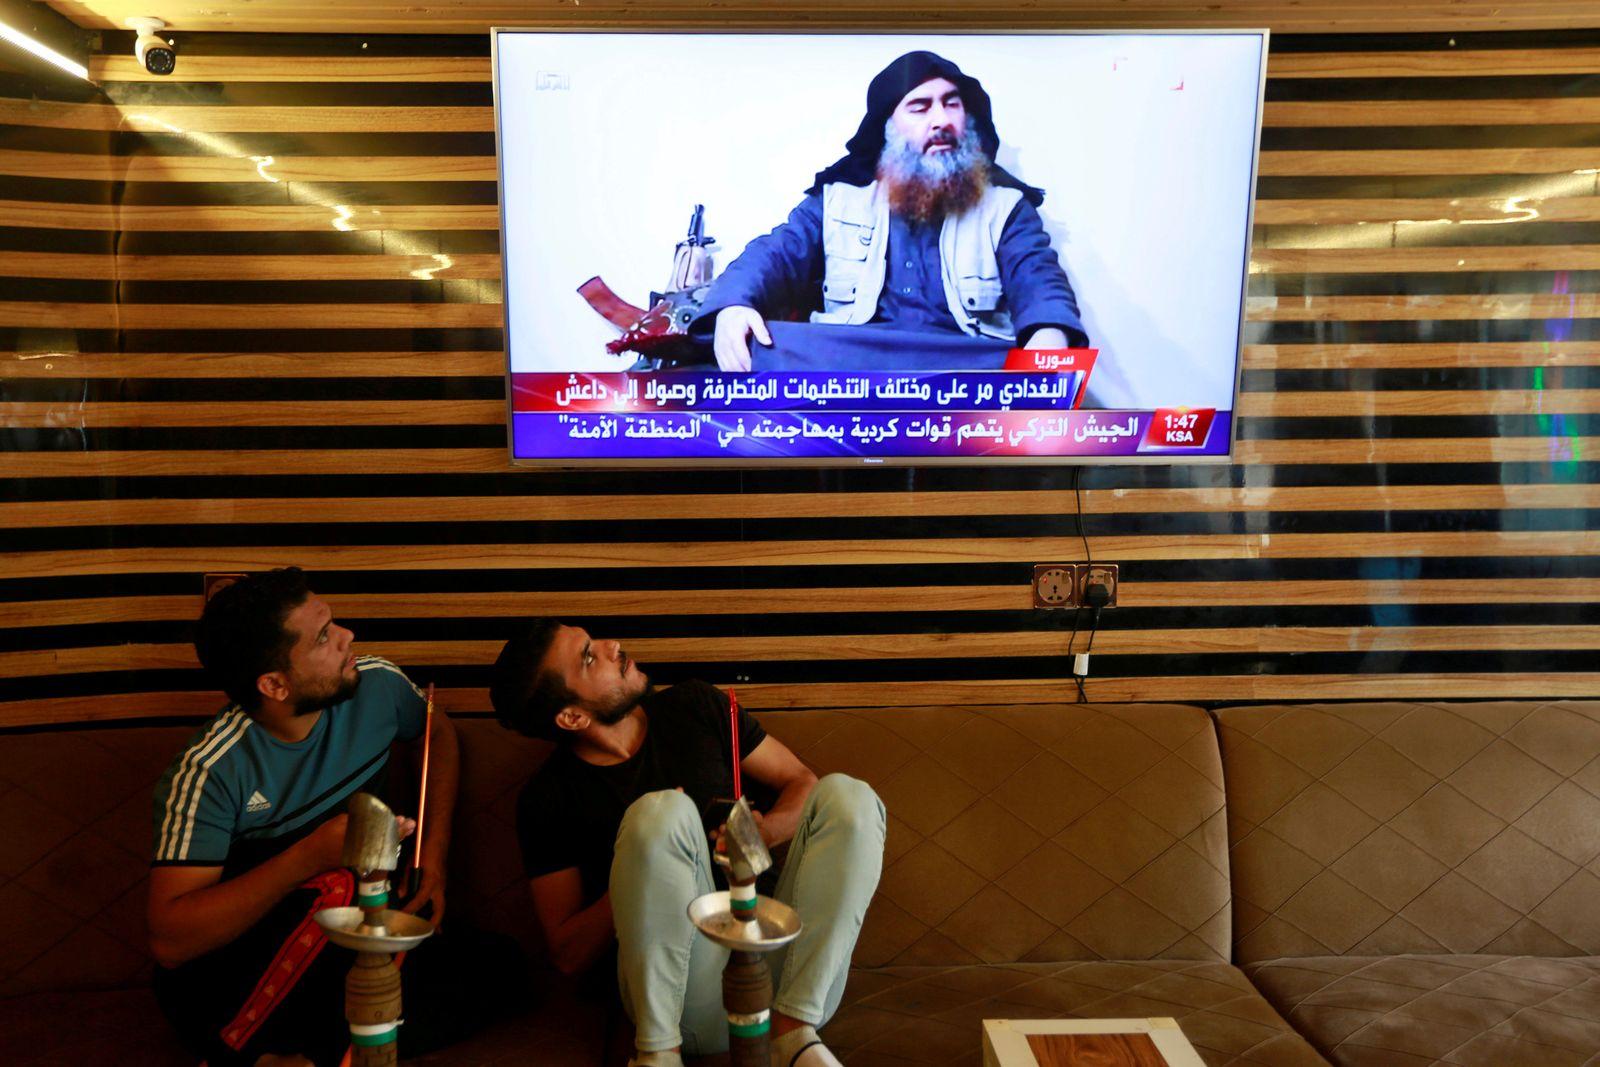 Iraqi youth watch the news of Islamic State leader Abu Bakr al-Baghdadi death, in Najaf